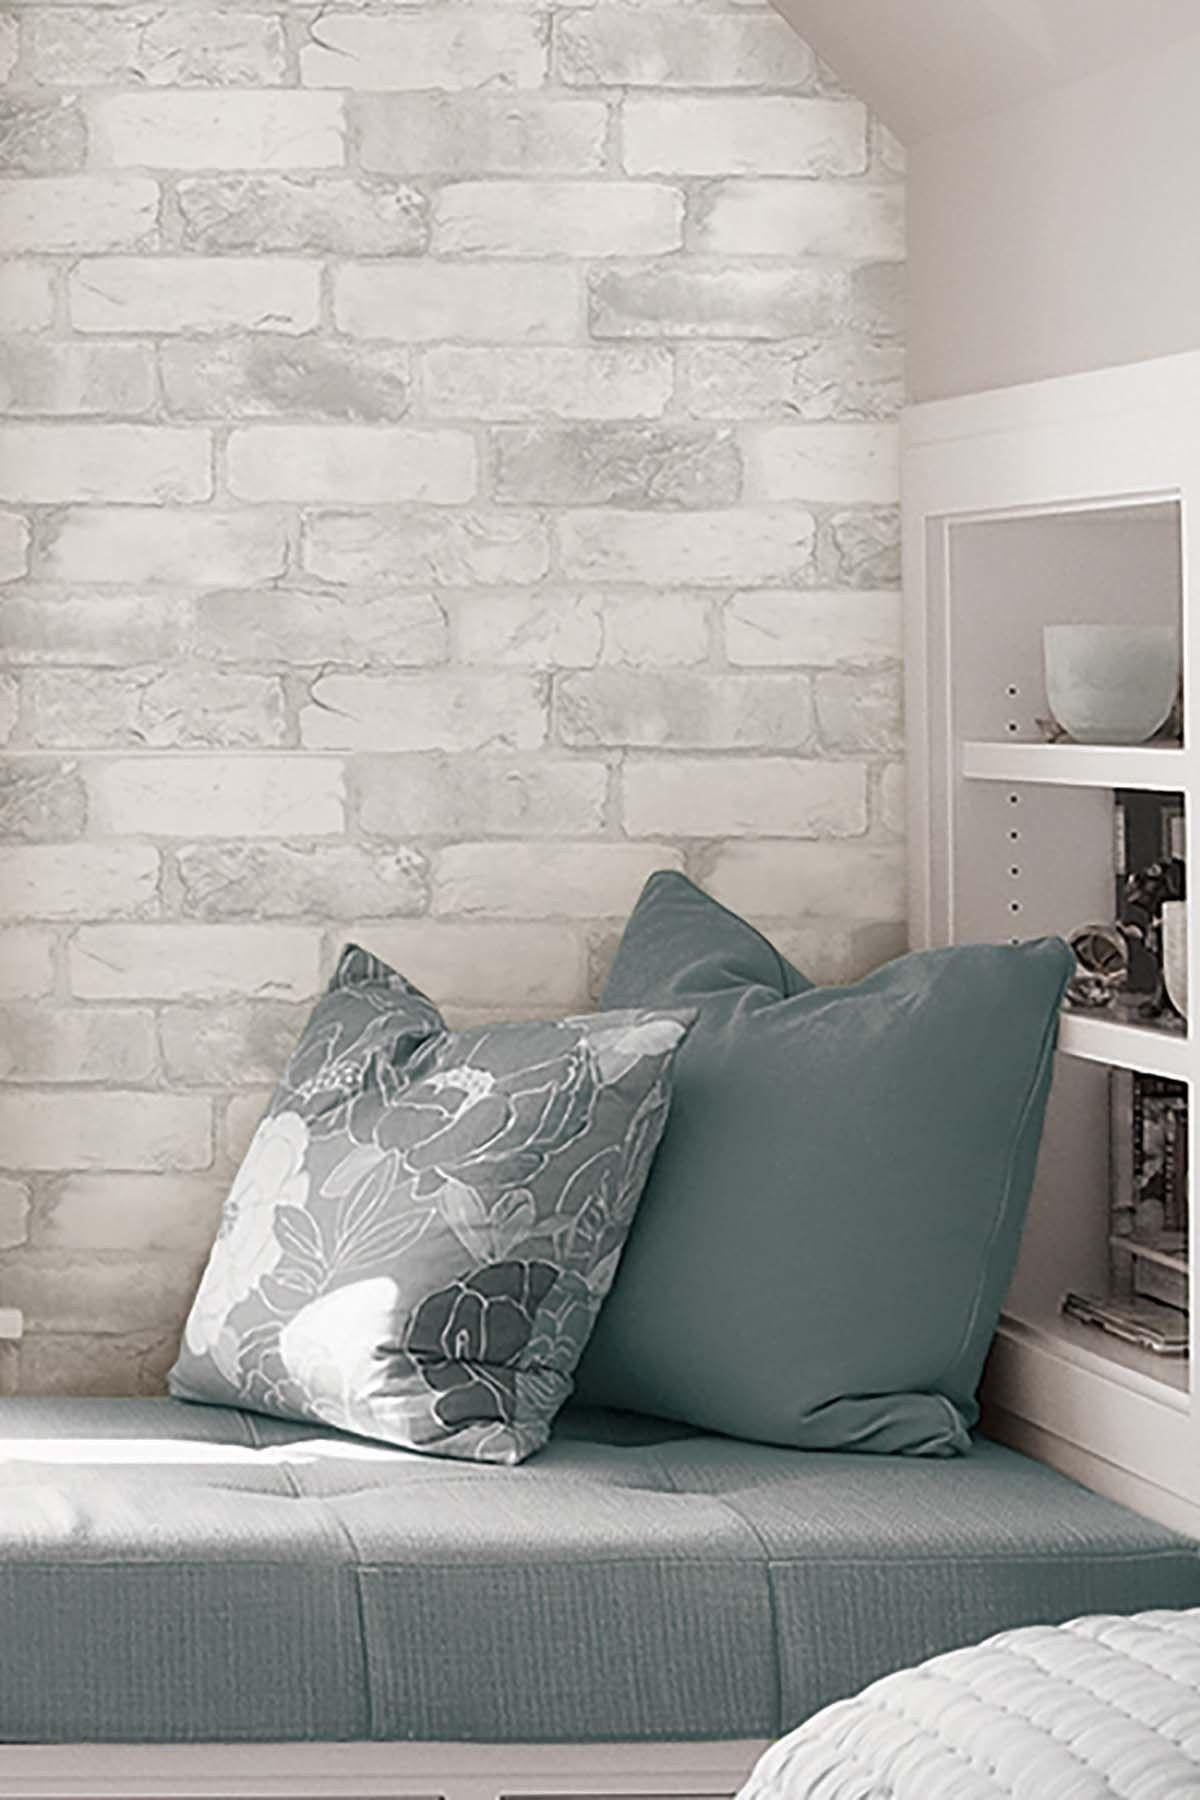 Wallpops Loft White Brick Peel Stick Wallpaper Hautelook In 2021 Brick Wallpaper Bedroom Brick Wall Bedroom Faux Brick Walls